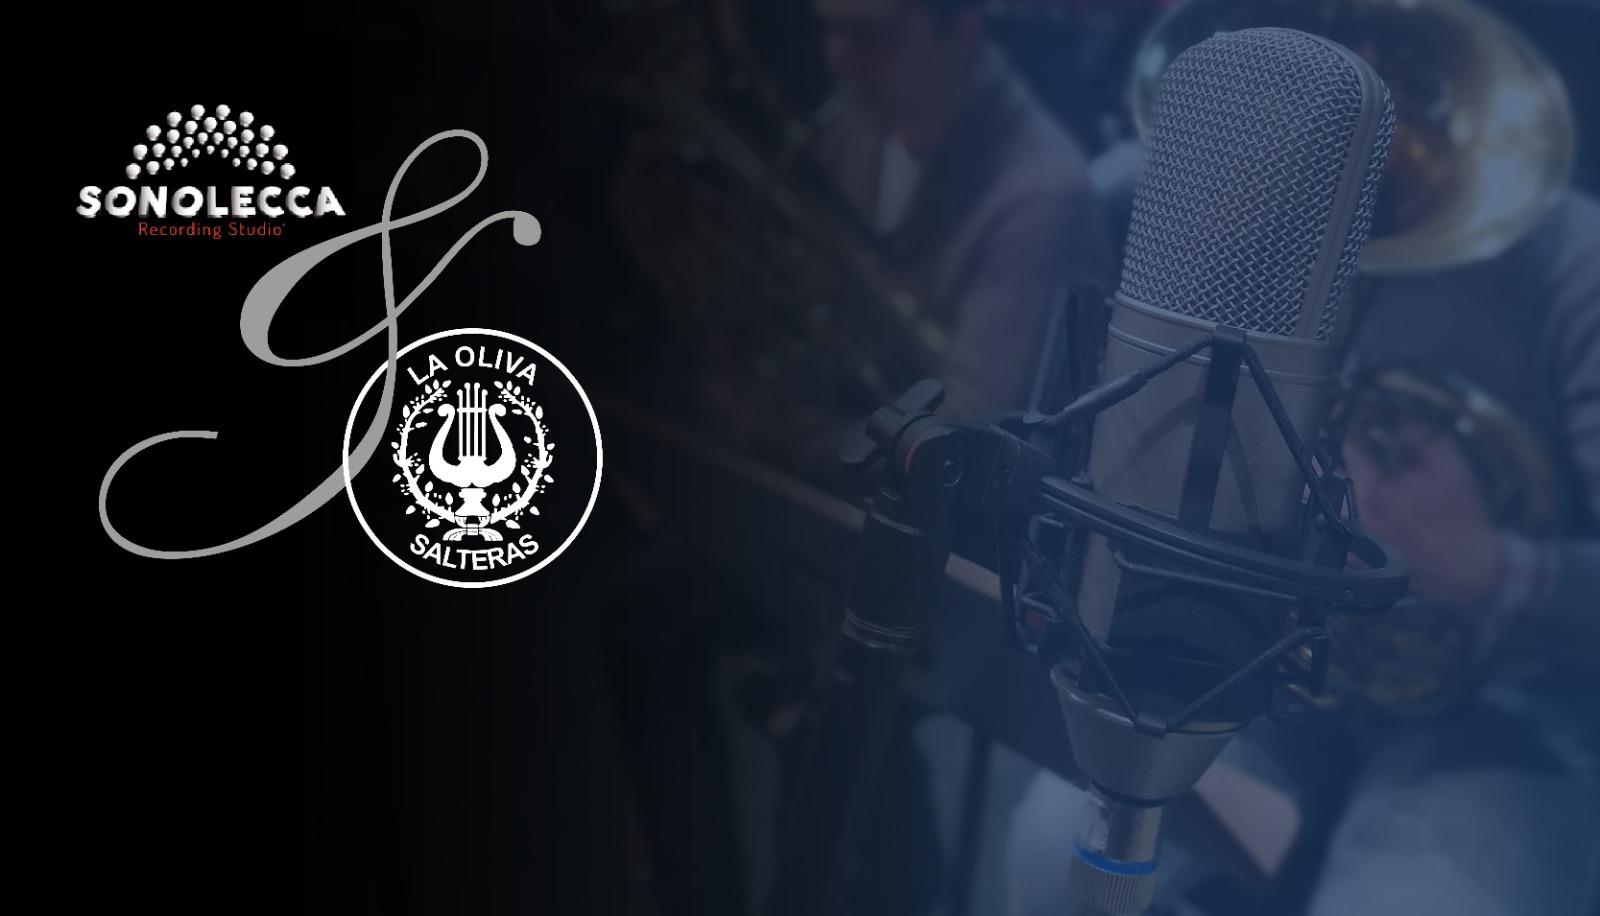 La Oliva y SonoLecca Recording Studio